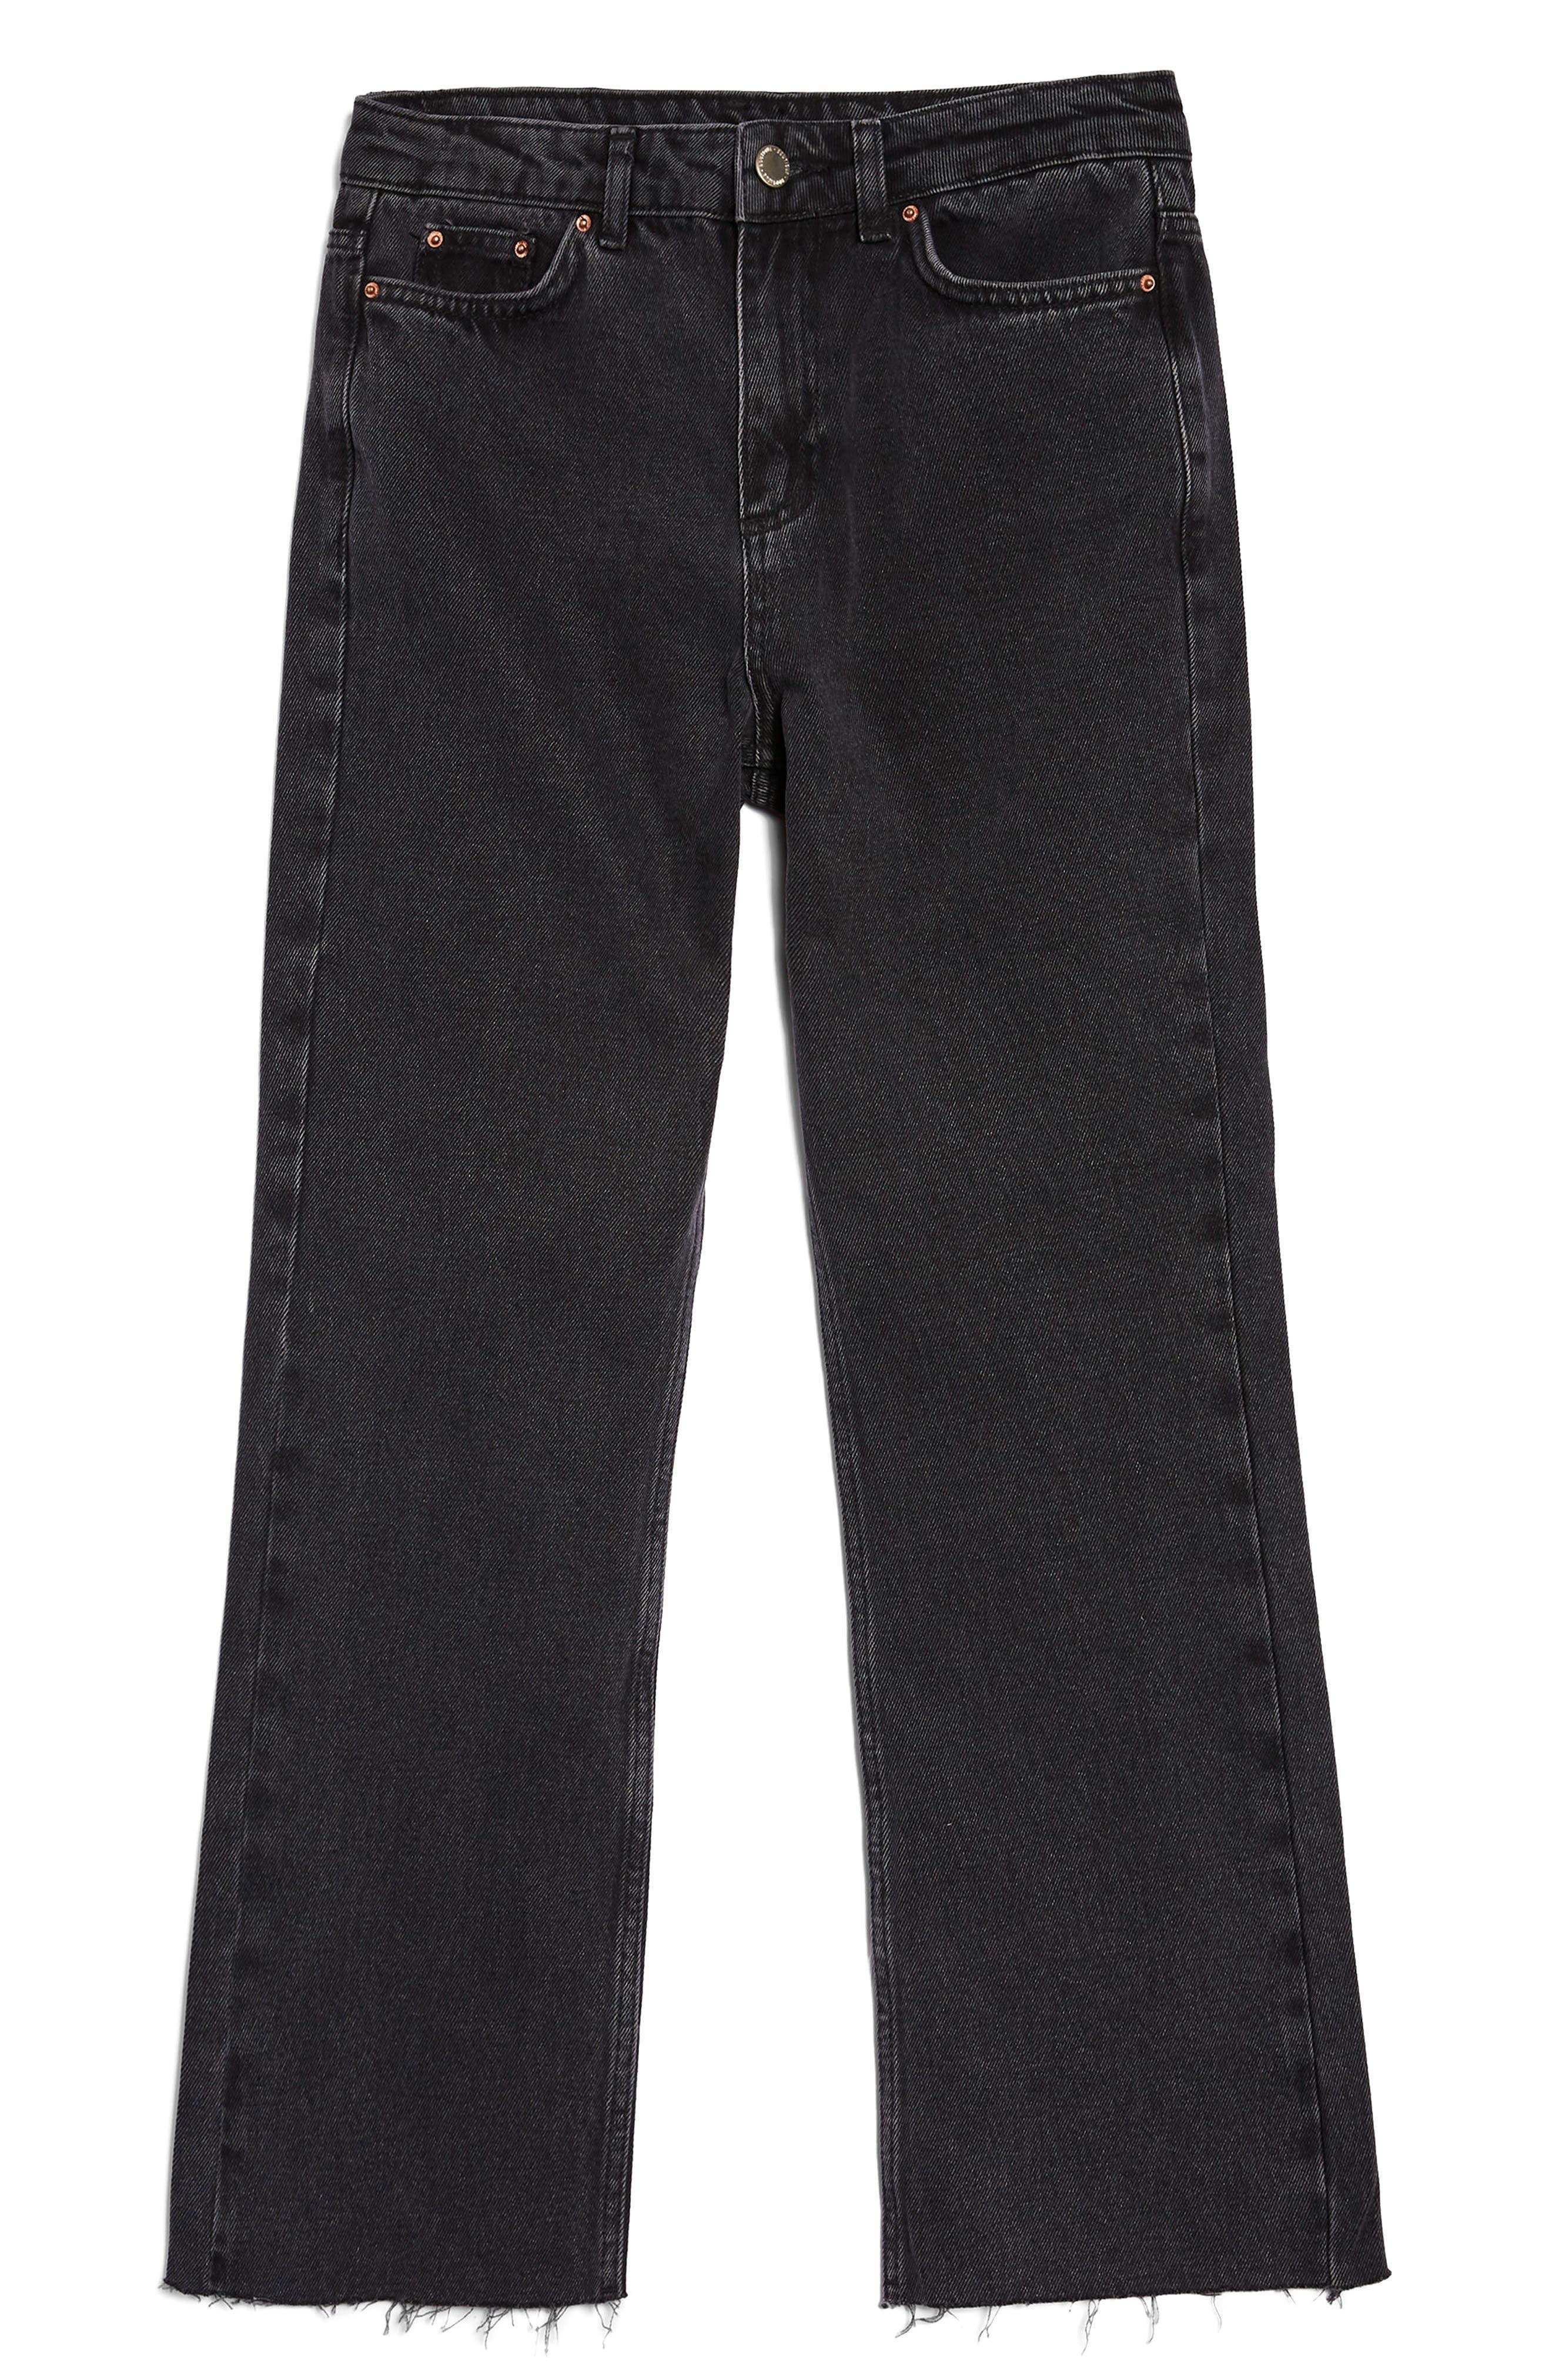 Alternate Image 1 Selected - Topshop Boutique Raw Hem Kick Flare Jeans